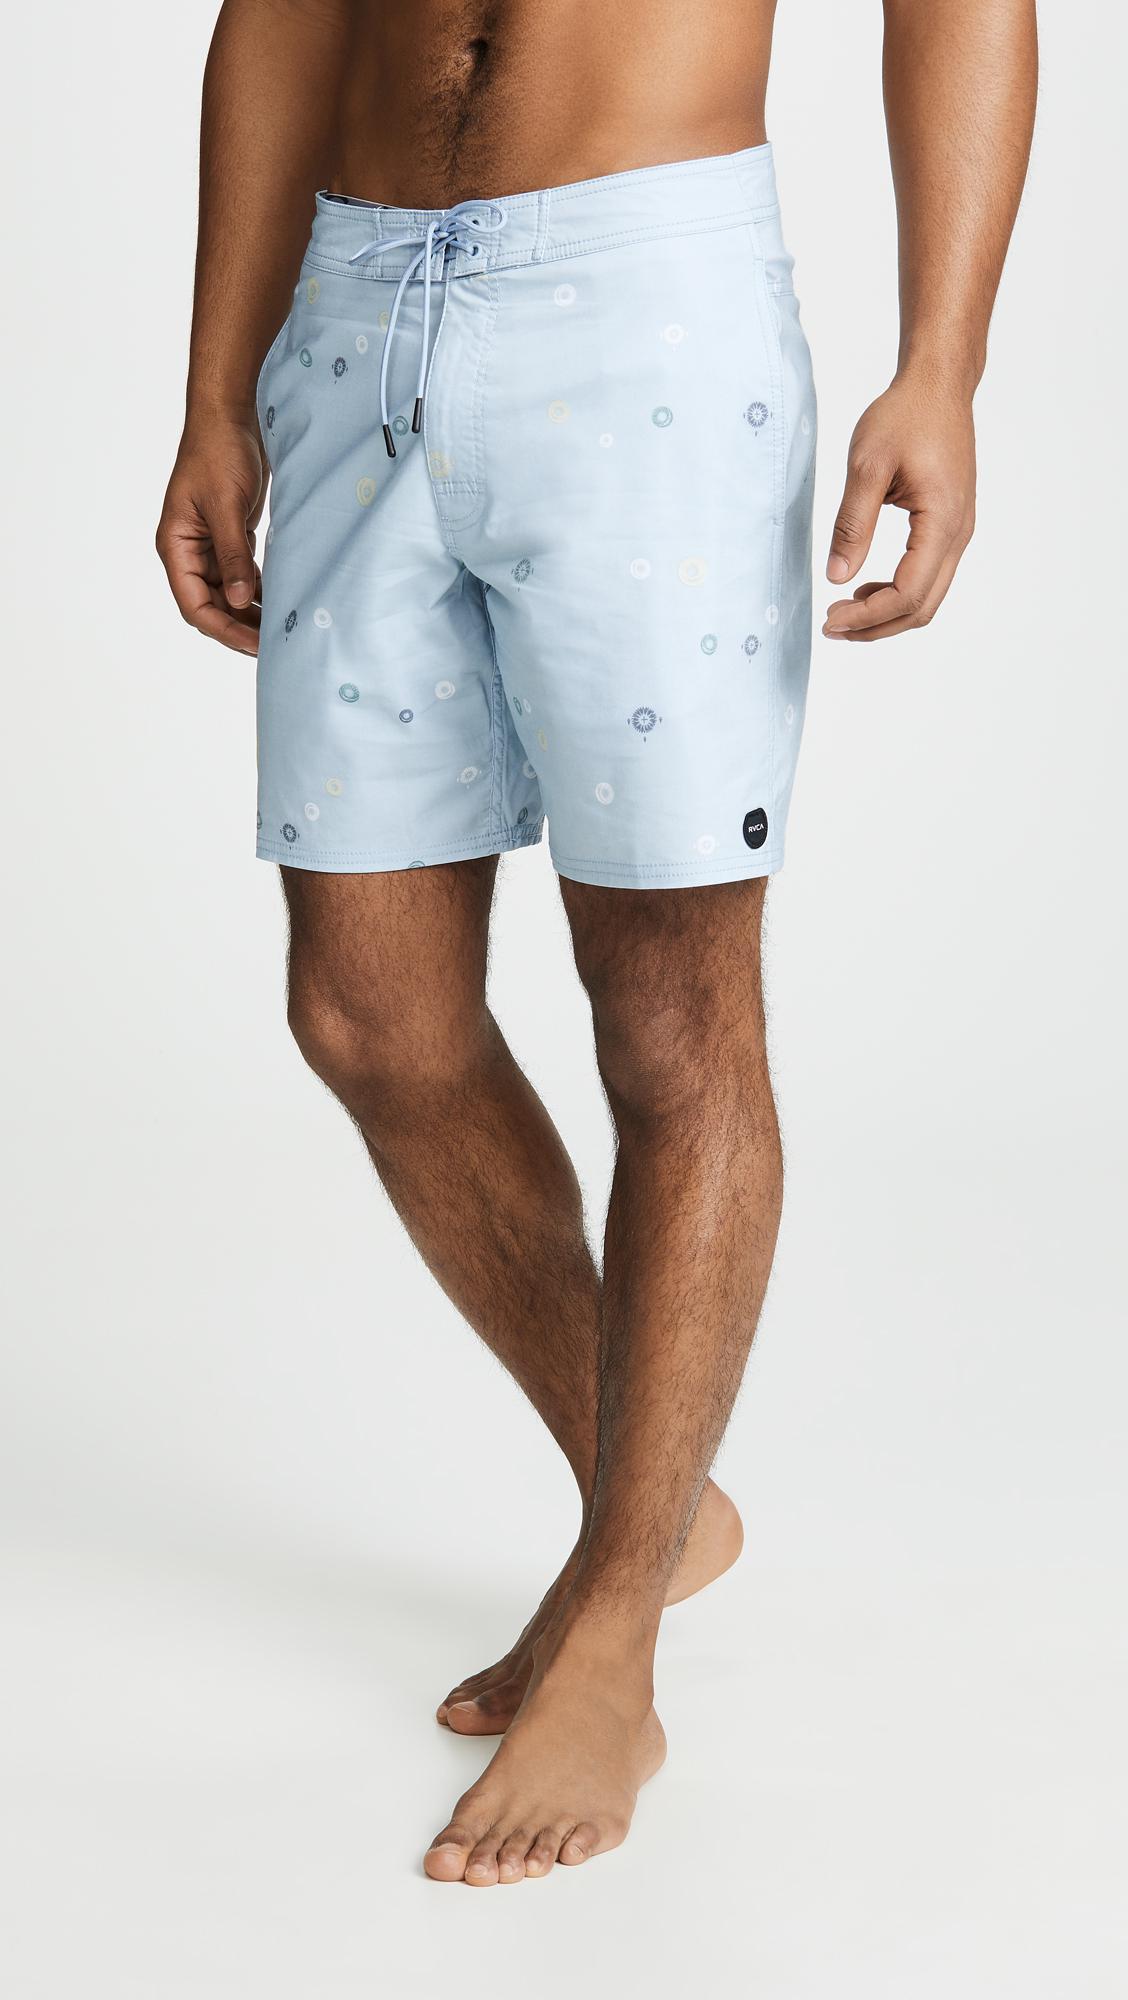 KCOSSH mandala boho bohemian turtle Funny Crew Sock Fashion Calf Socks for Mens